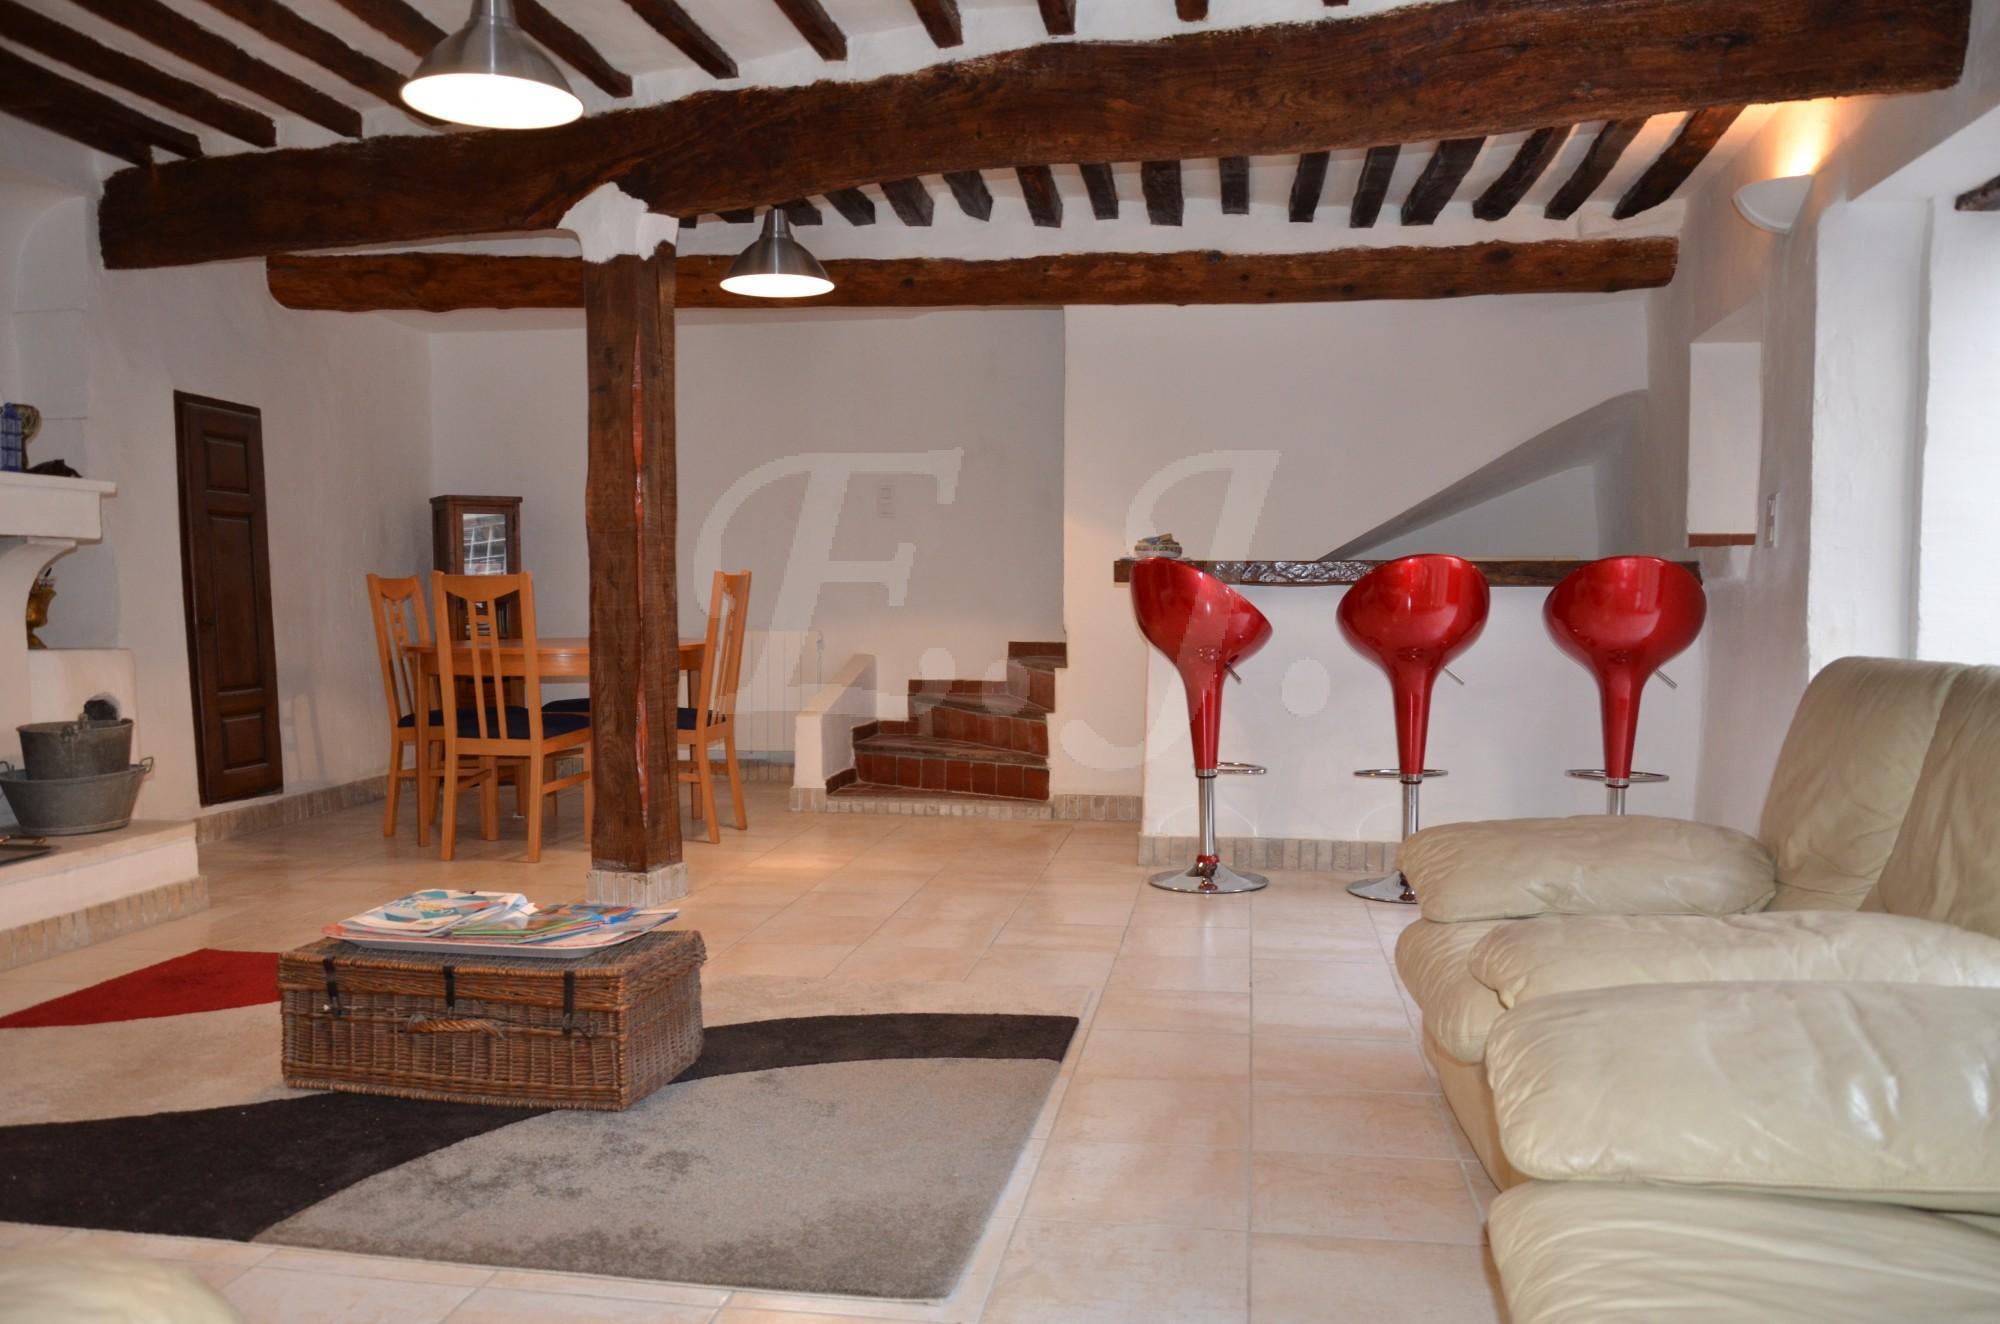 renovation maison de village rnovation maison de village with renovation maison de village. Black Bedroom Furniture Sets. Home Design Ideas